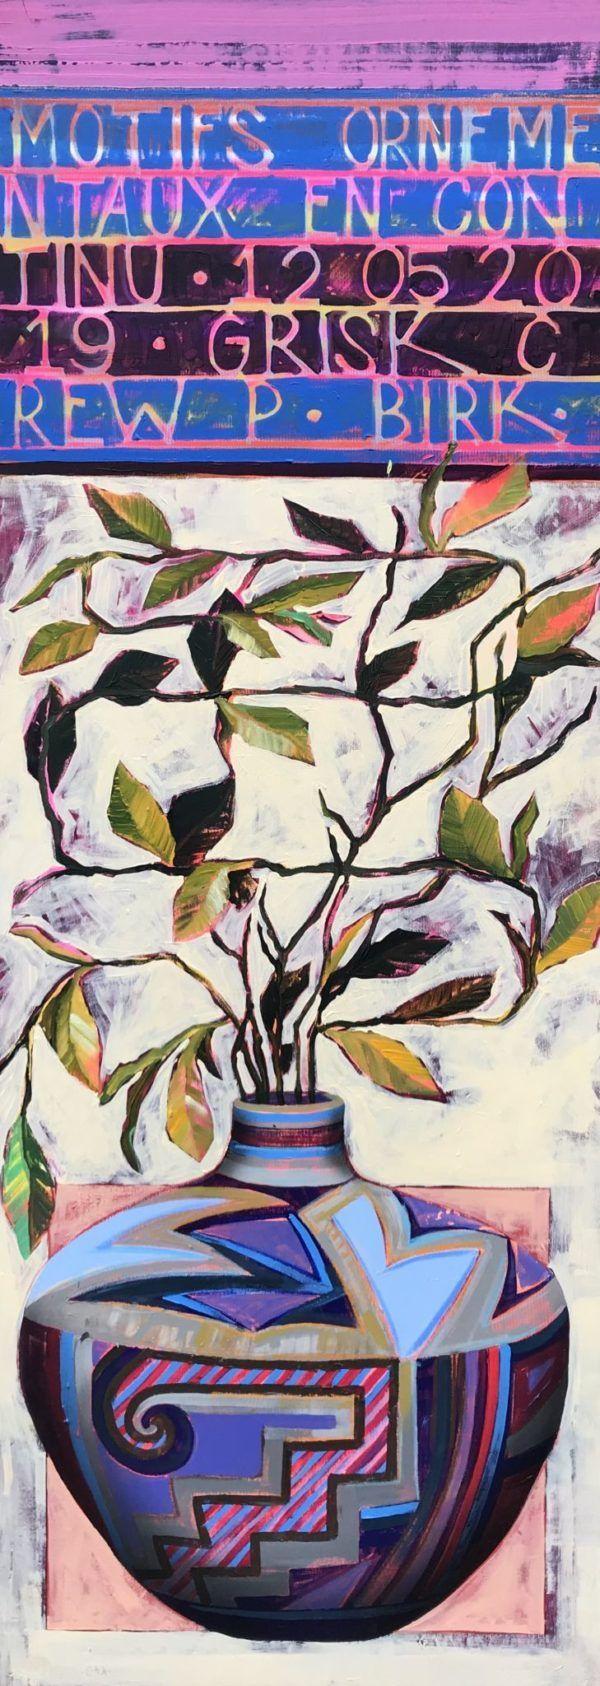 Peter Birk, Galleri, kbh, kunst, maleri